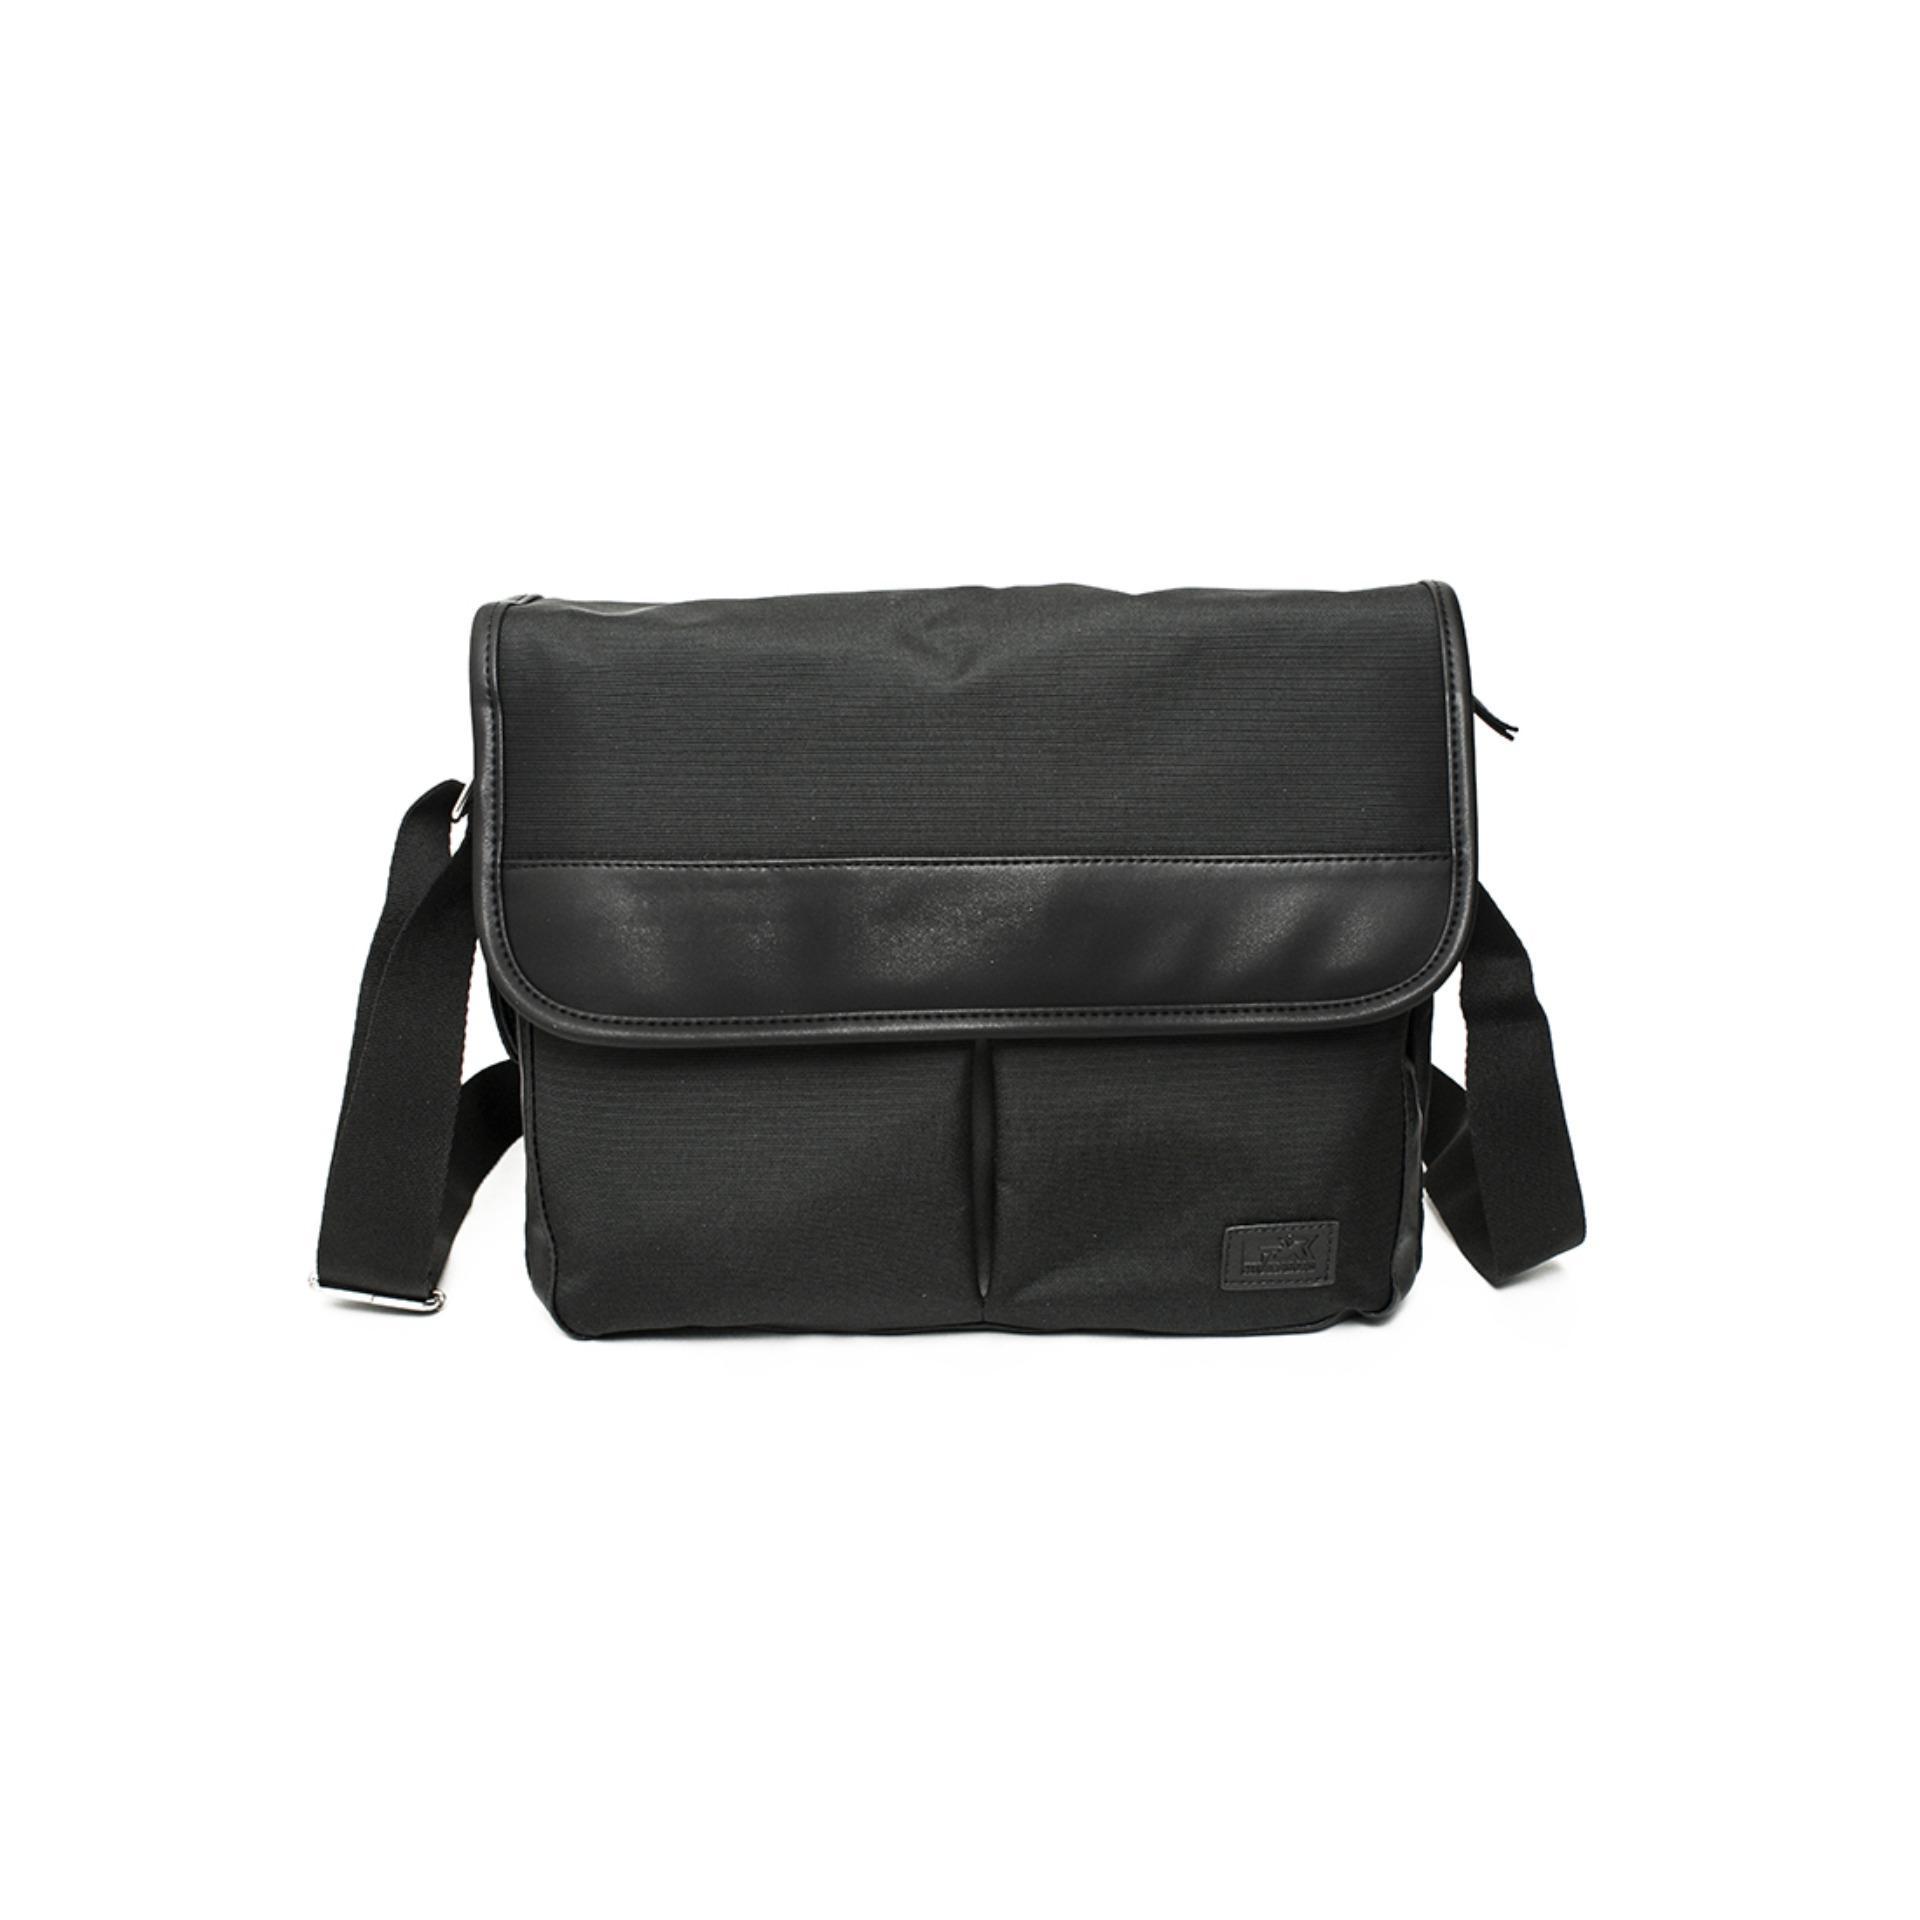 a8eb6485c7 FX Creations CCQ Front Flap Messenger Bag